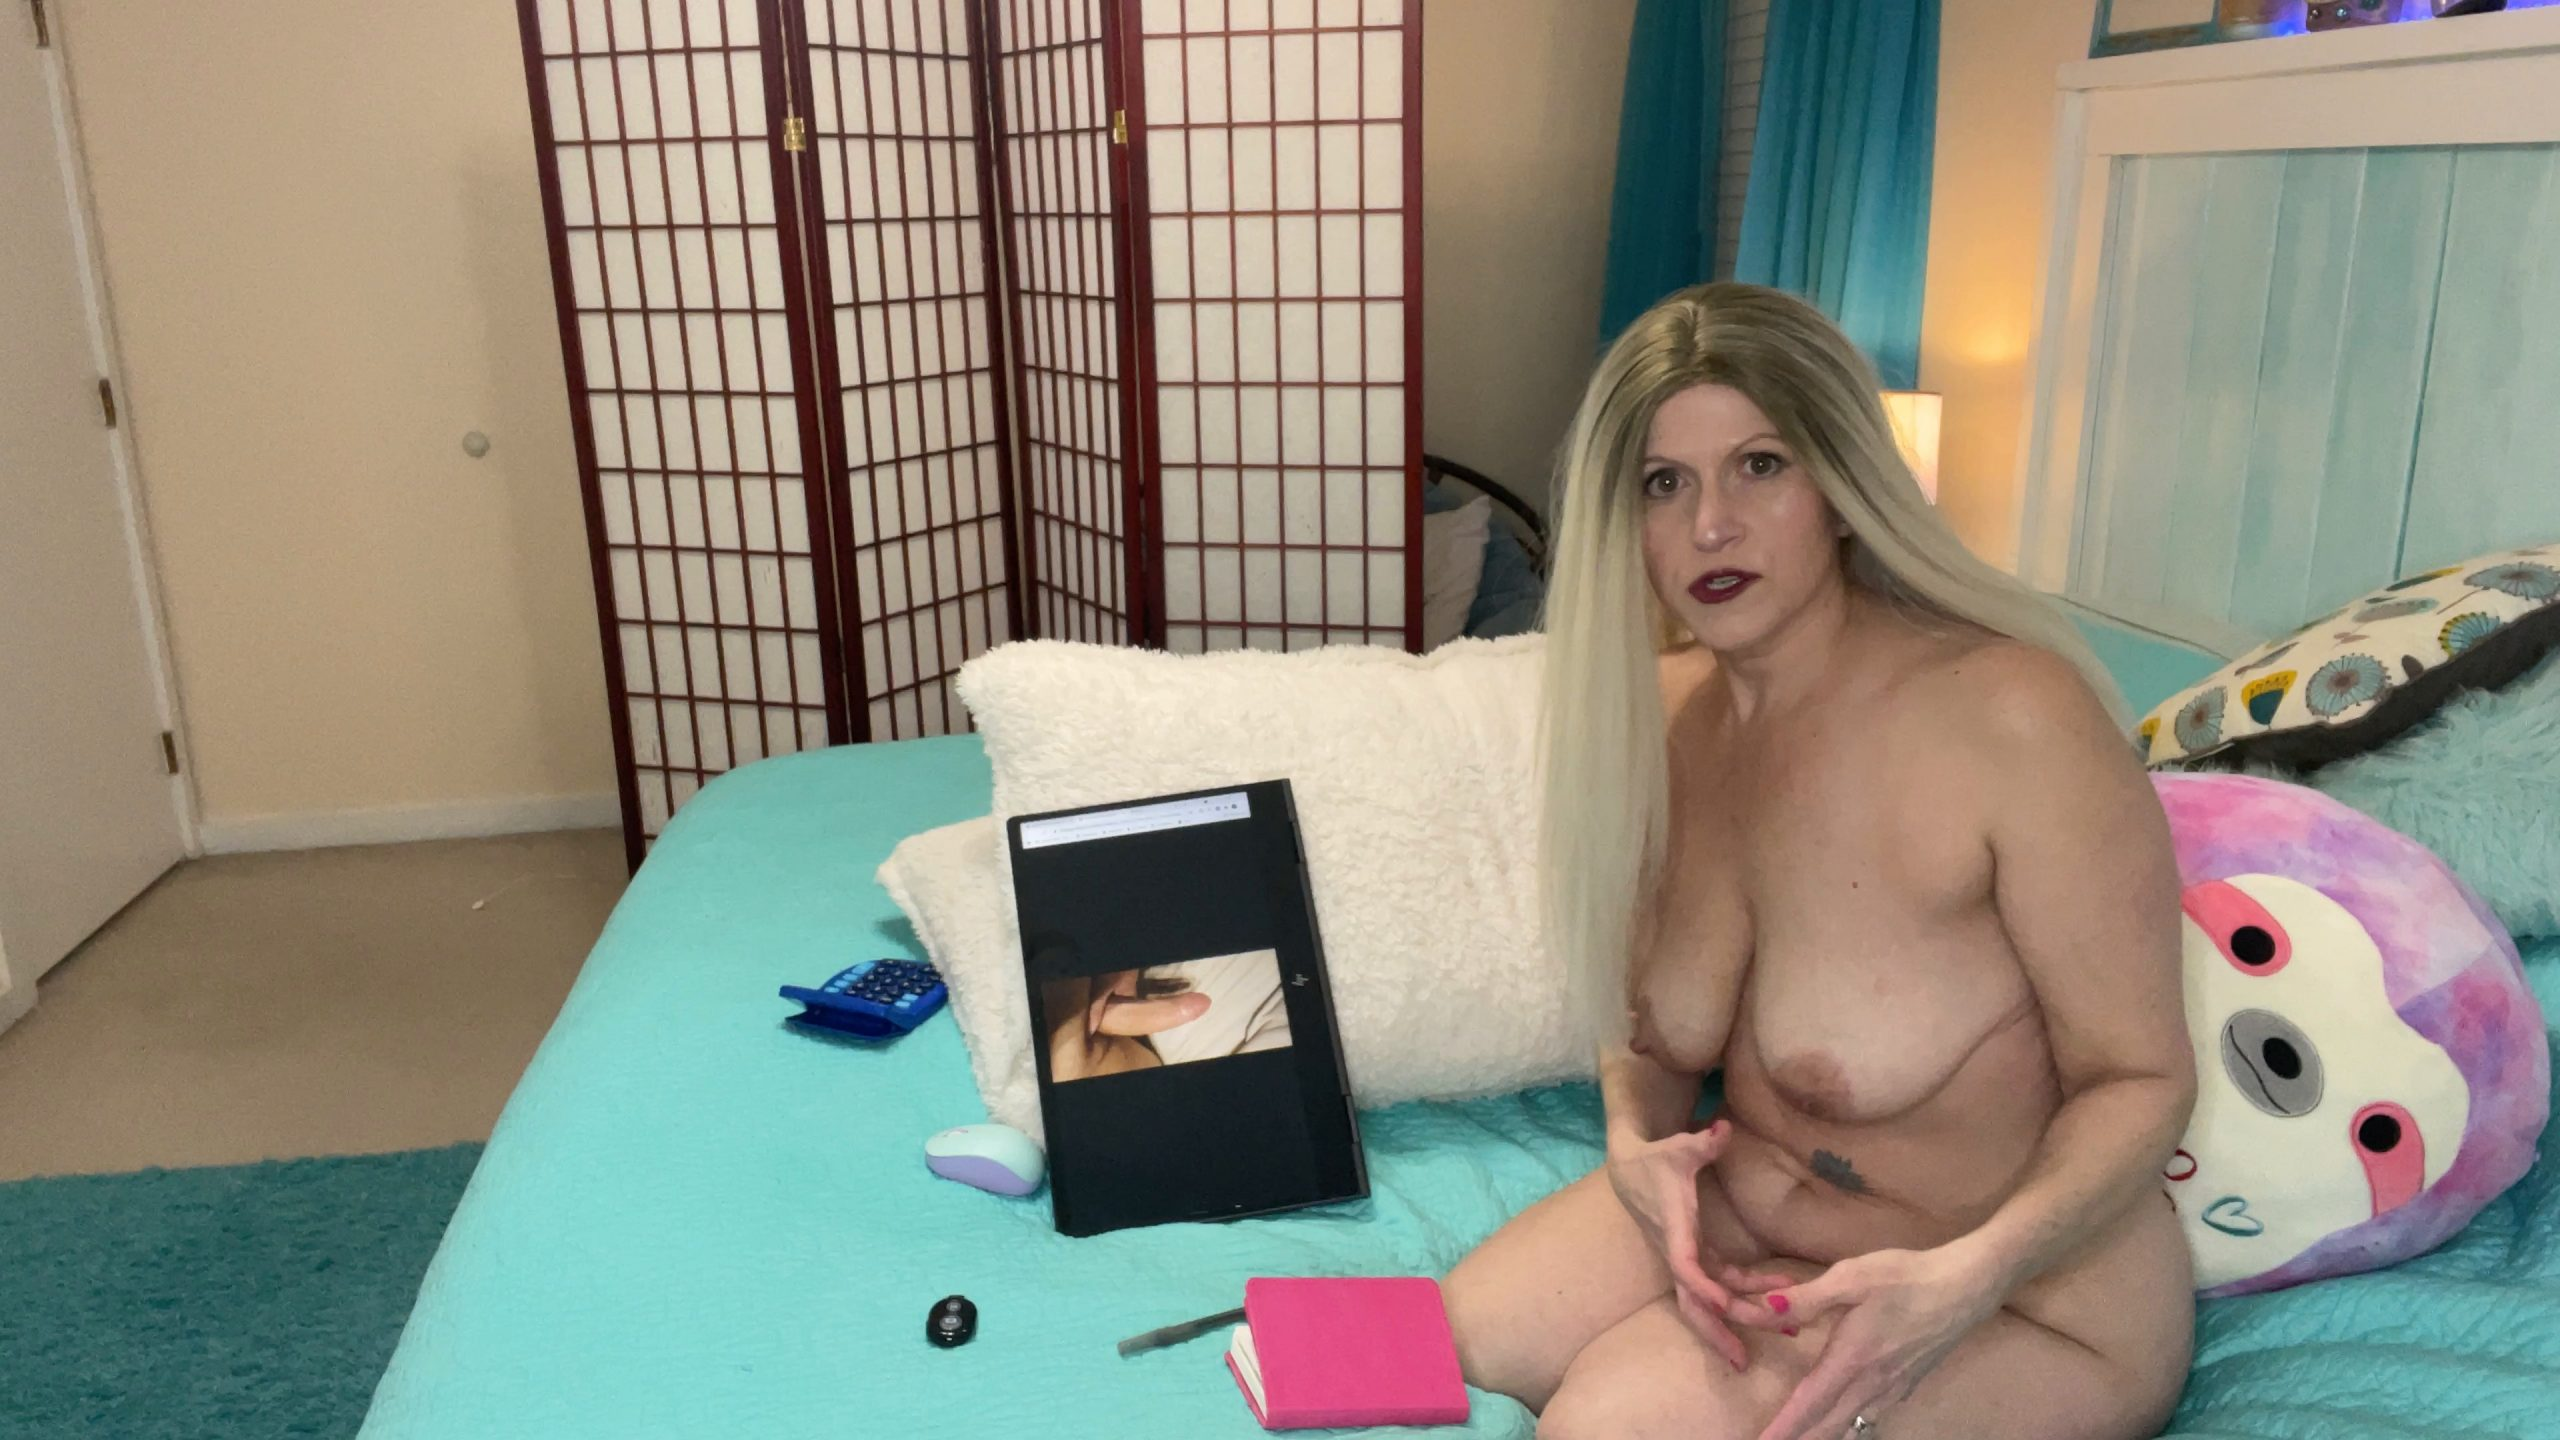 TabithaXXX - Moms Nude Cock Rating / Dan